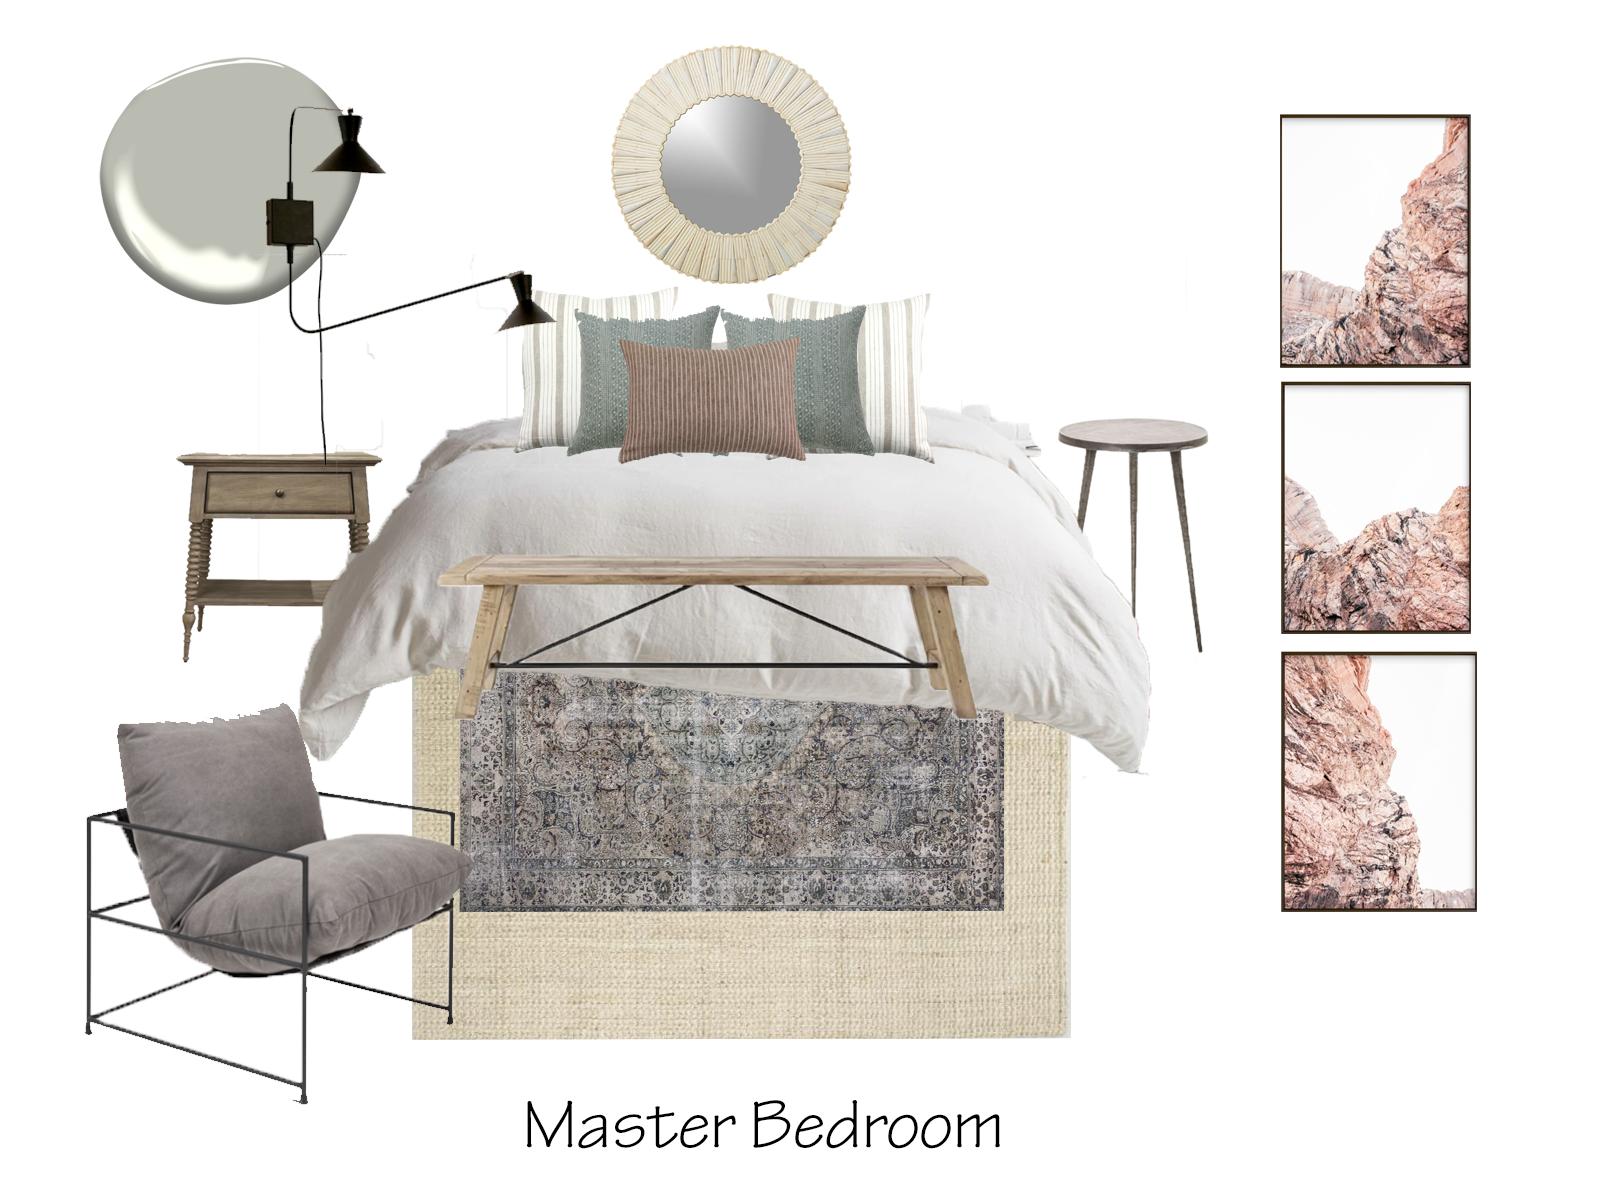 Brennan's Master Bedroom Series Of Art _edited-1.png